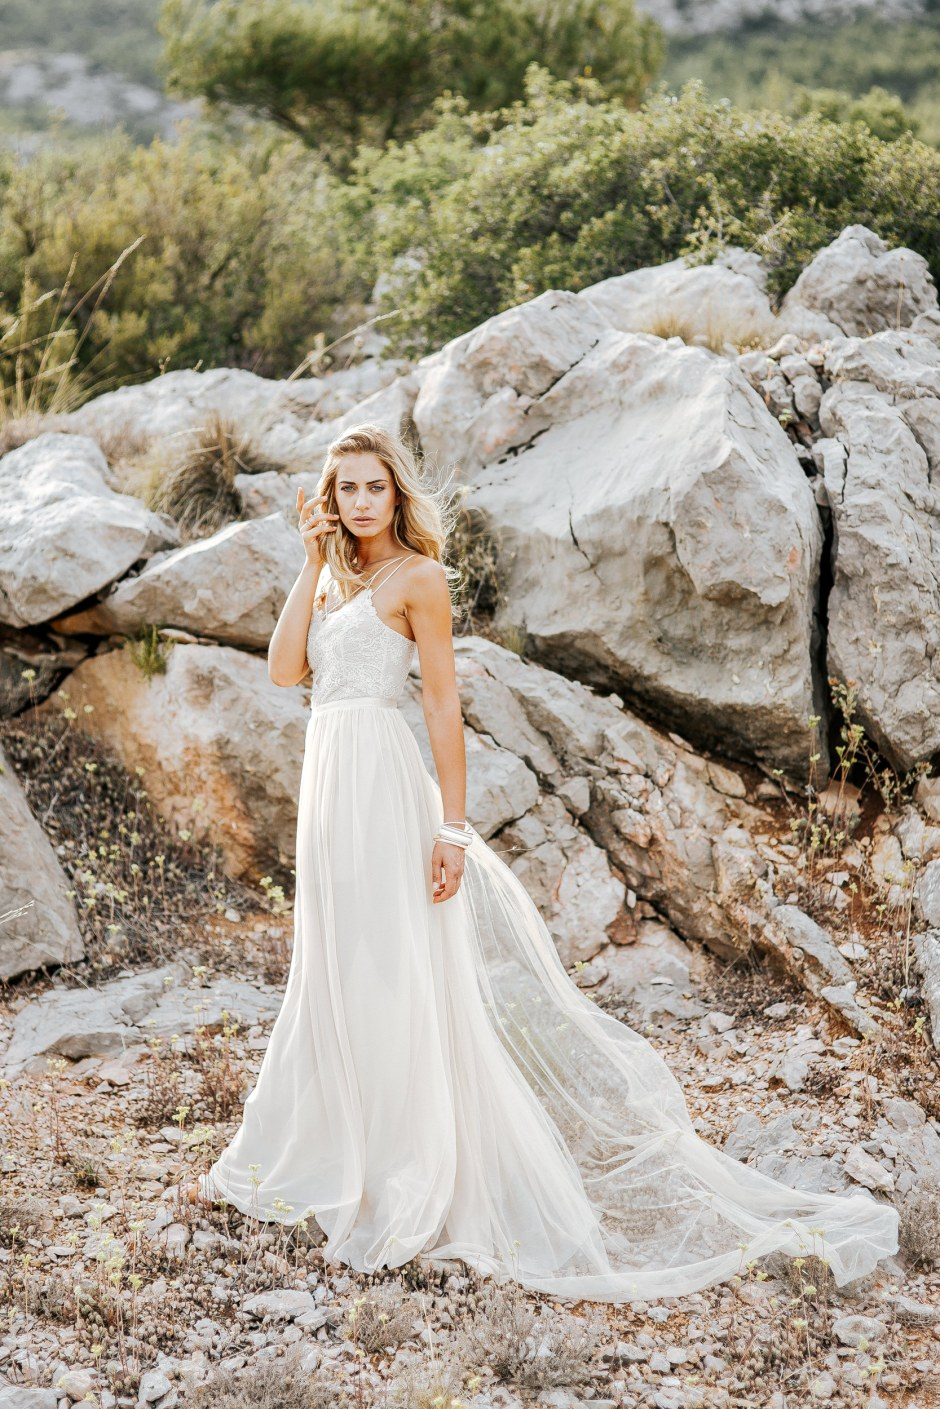 elisa-ness-la-blogueuse-mariage-28